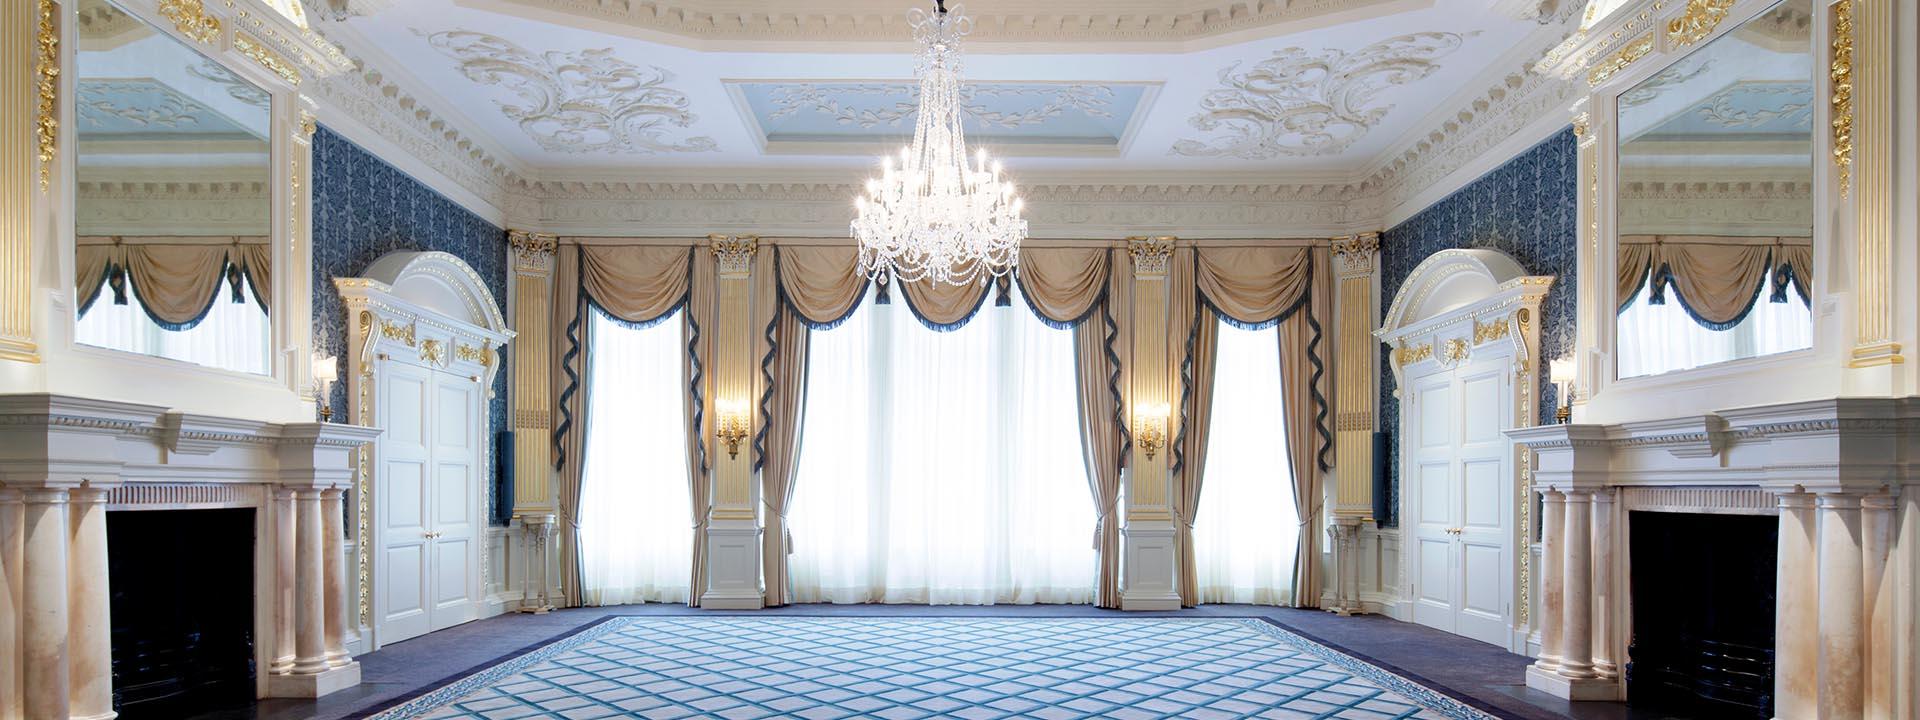 Claridges drawing room - Charlotte Munro luxury weddings